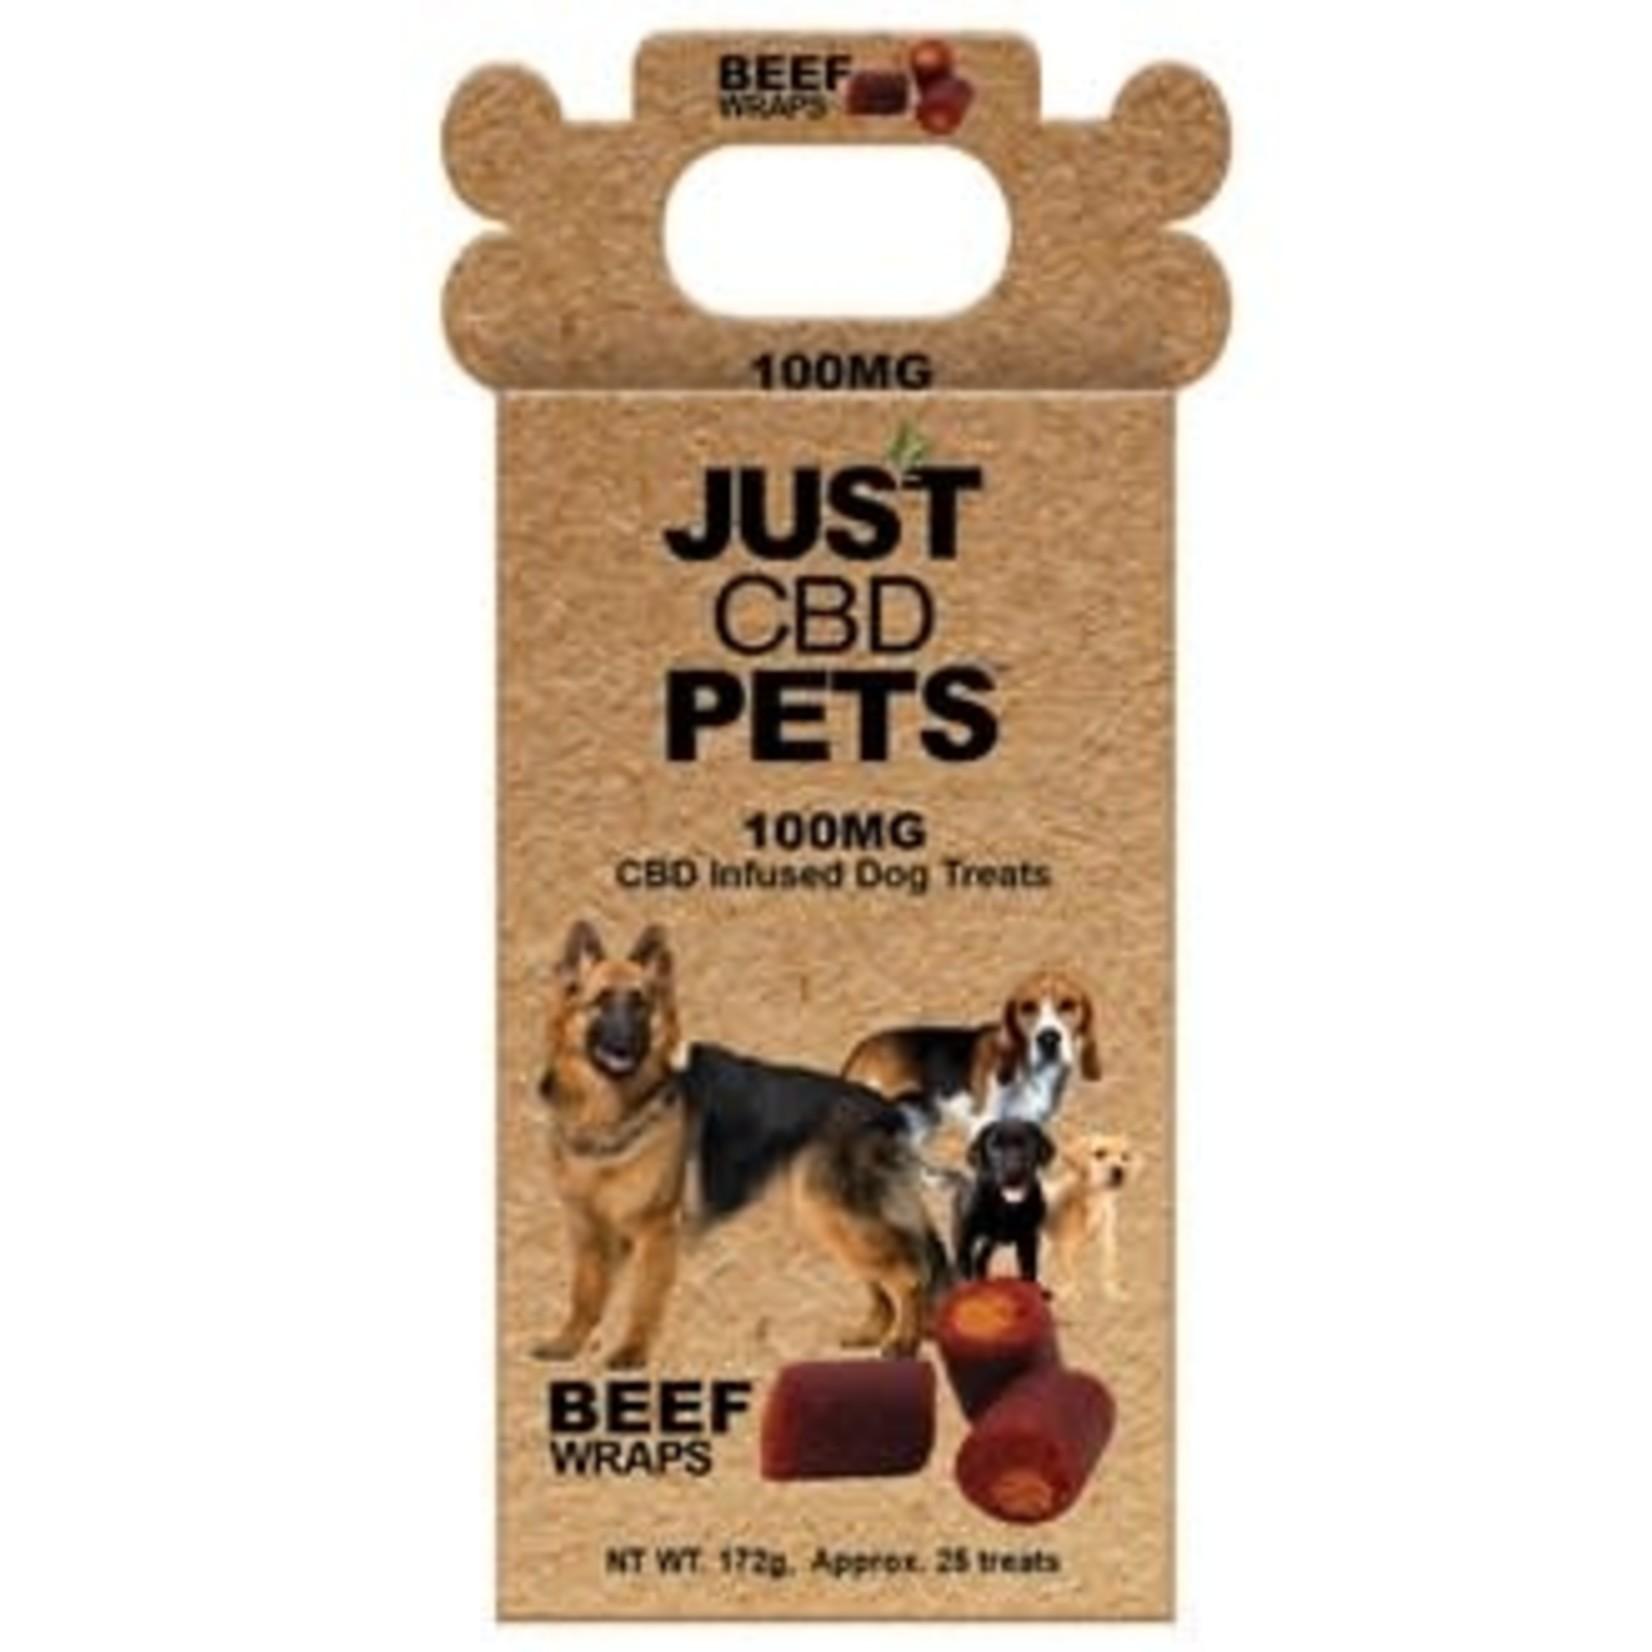 Just CBD Just CBD Pets 100mg Infused Dog Treats